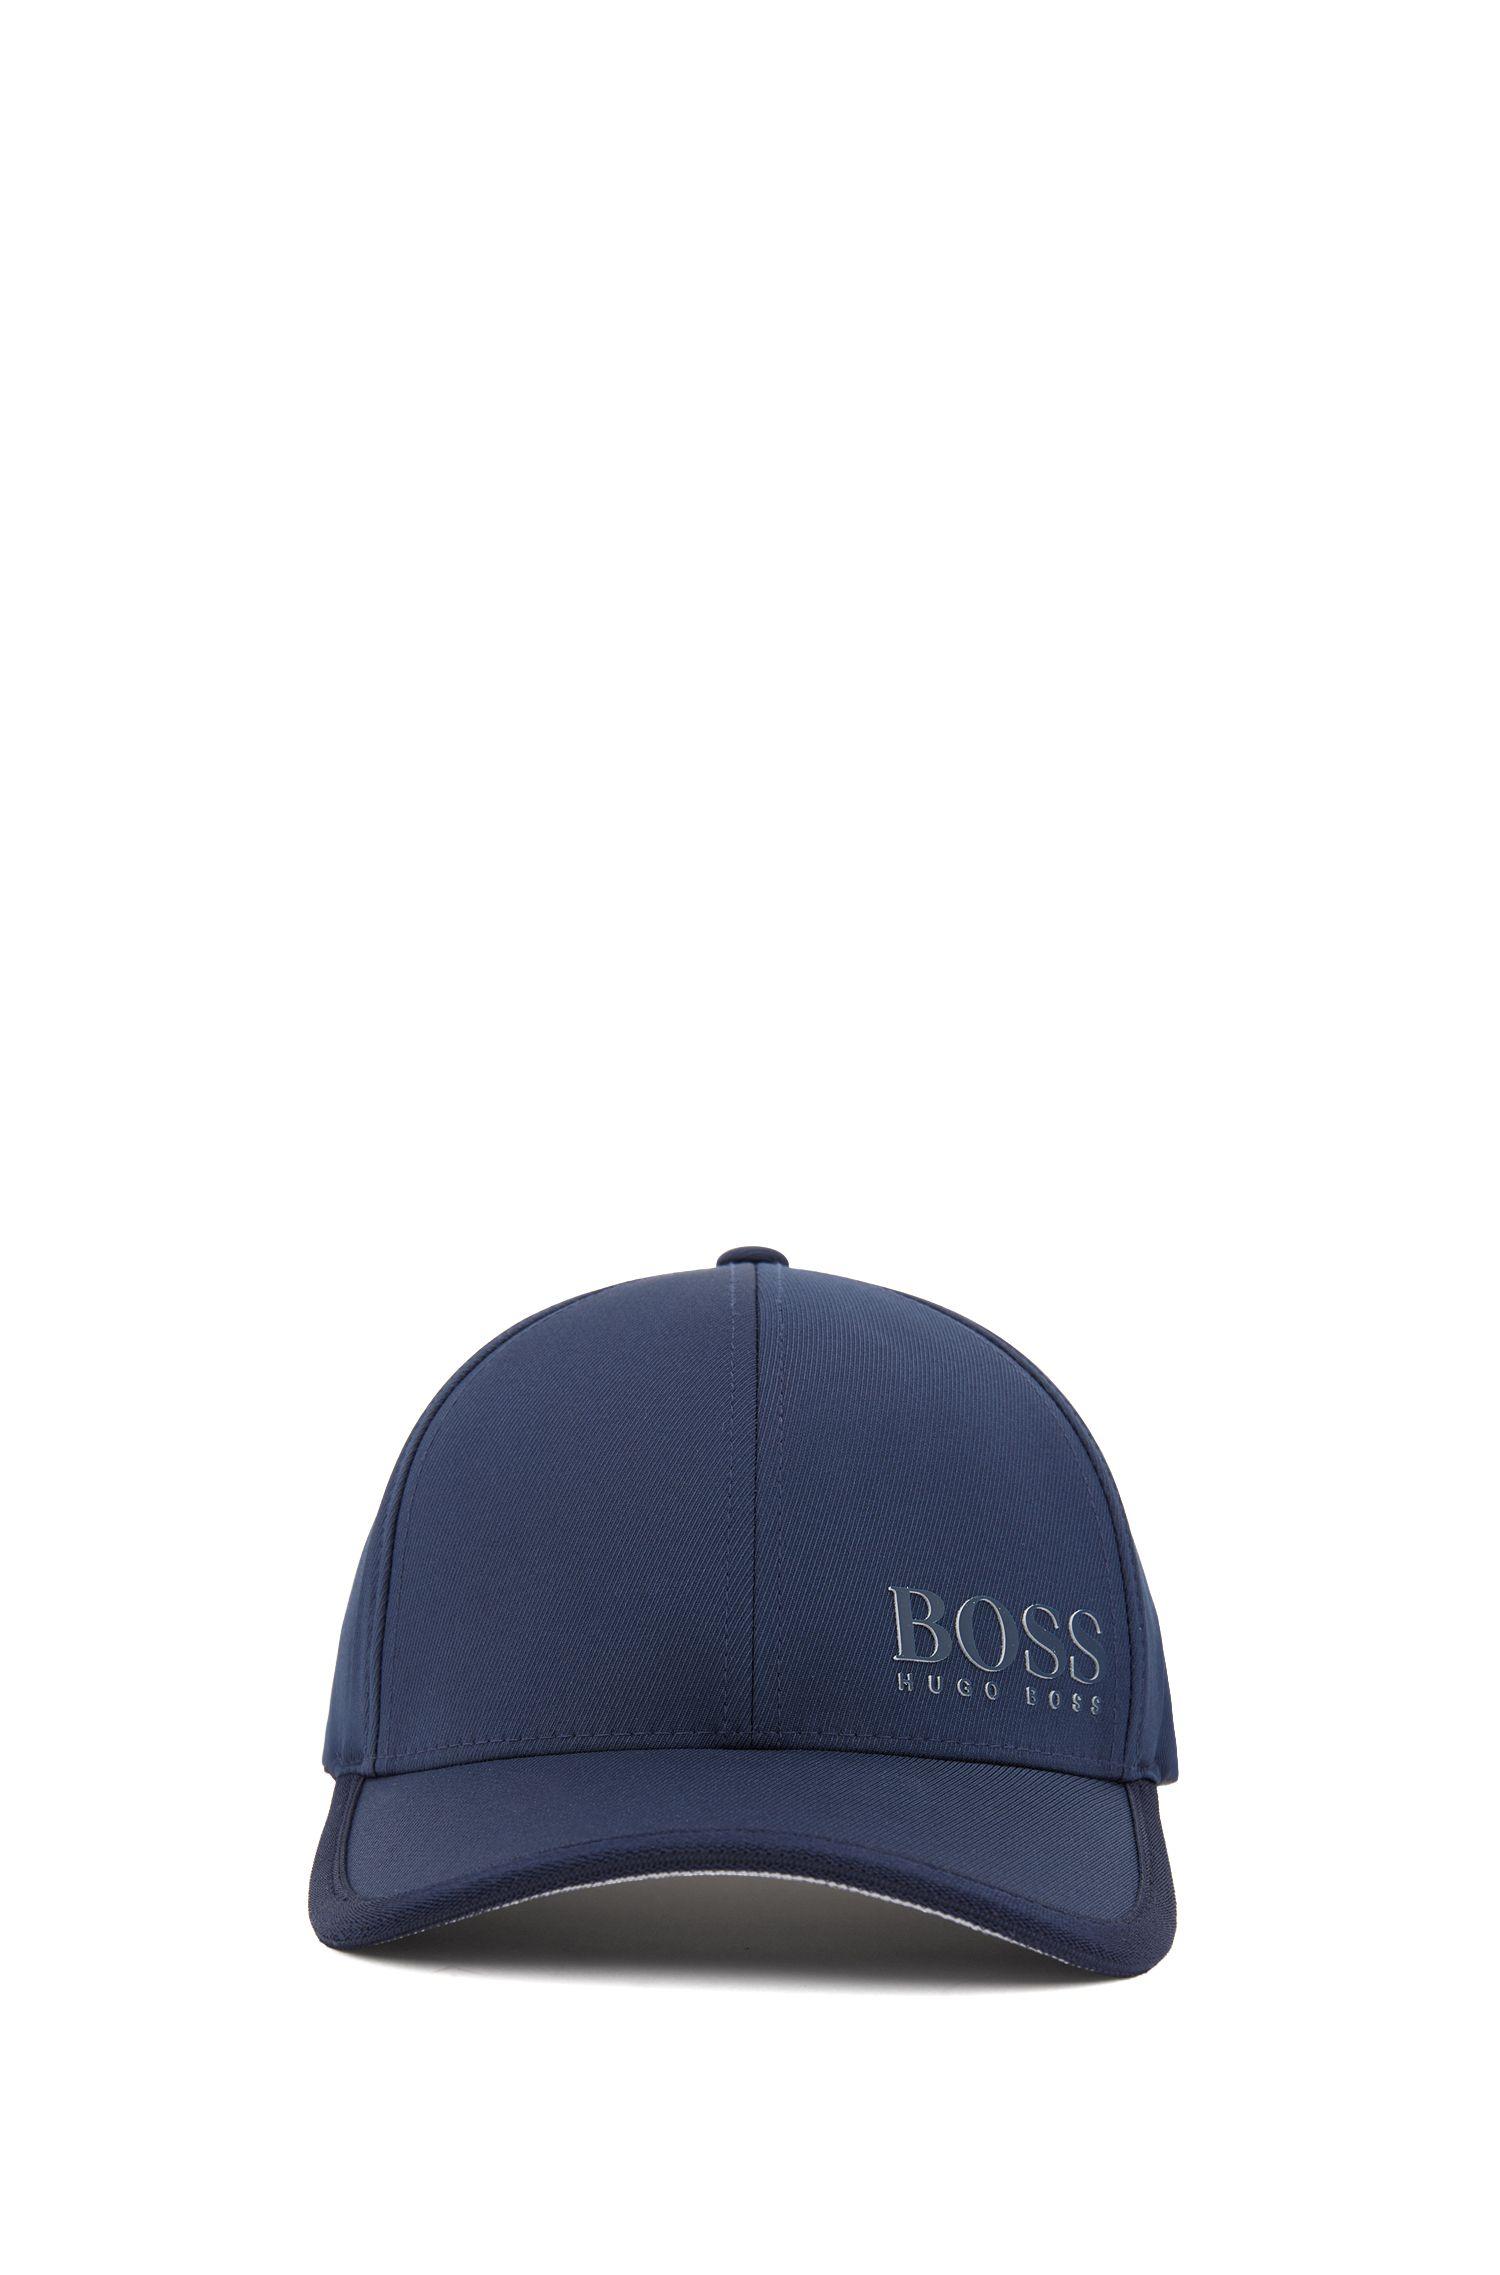 Cap in technical stretch twill with 3D logo , Dark Blue